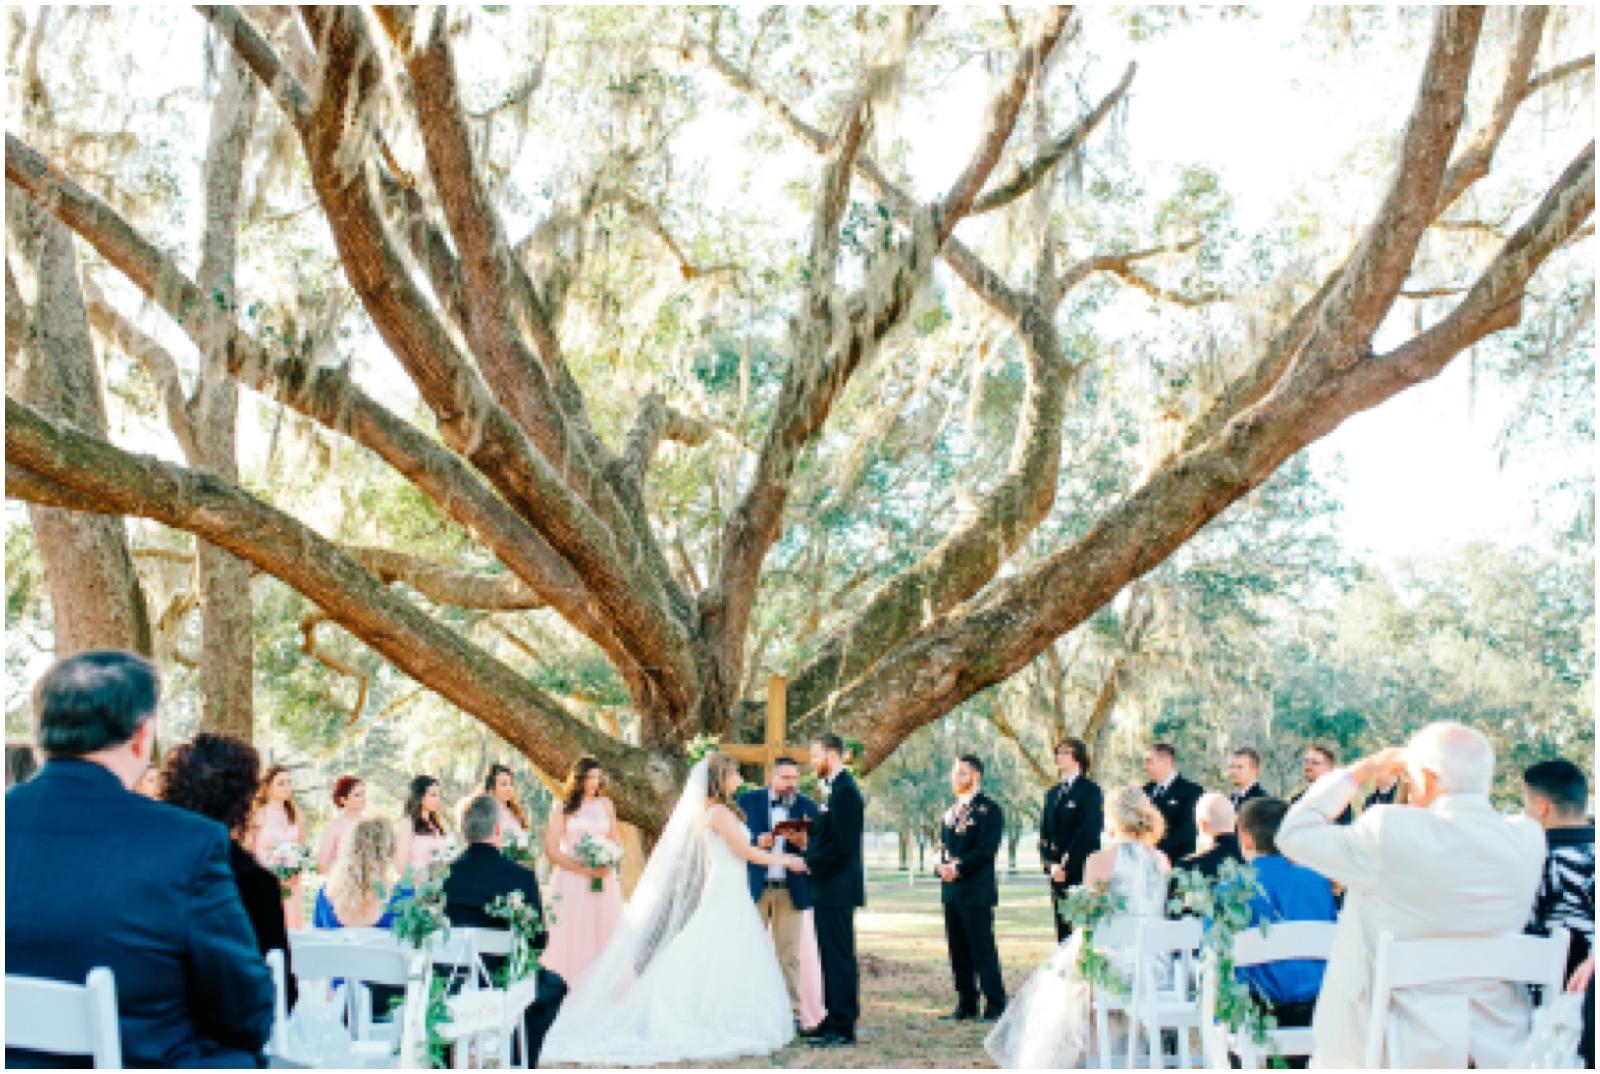 Tampa Area Wedding Venue with Southern Charm- Stonebridge Events_0280.jpg